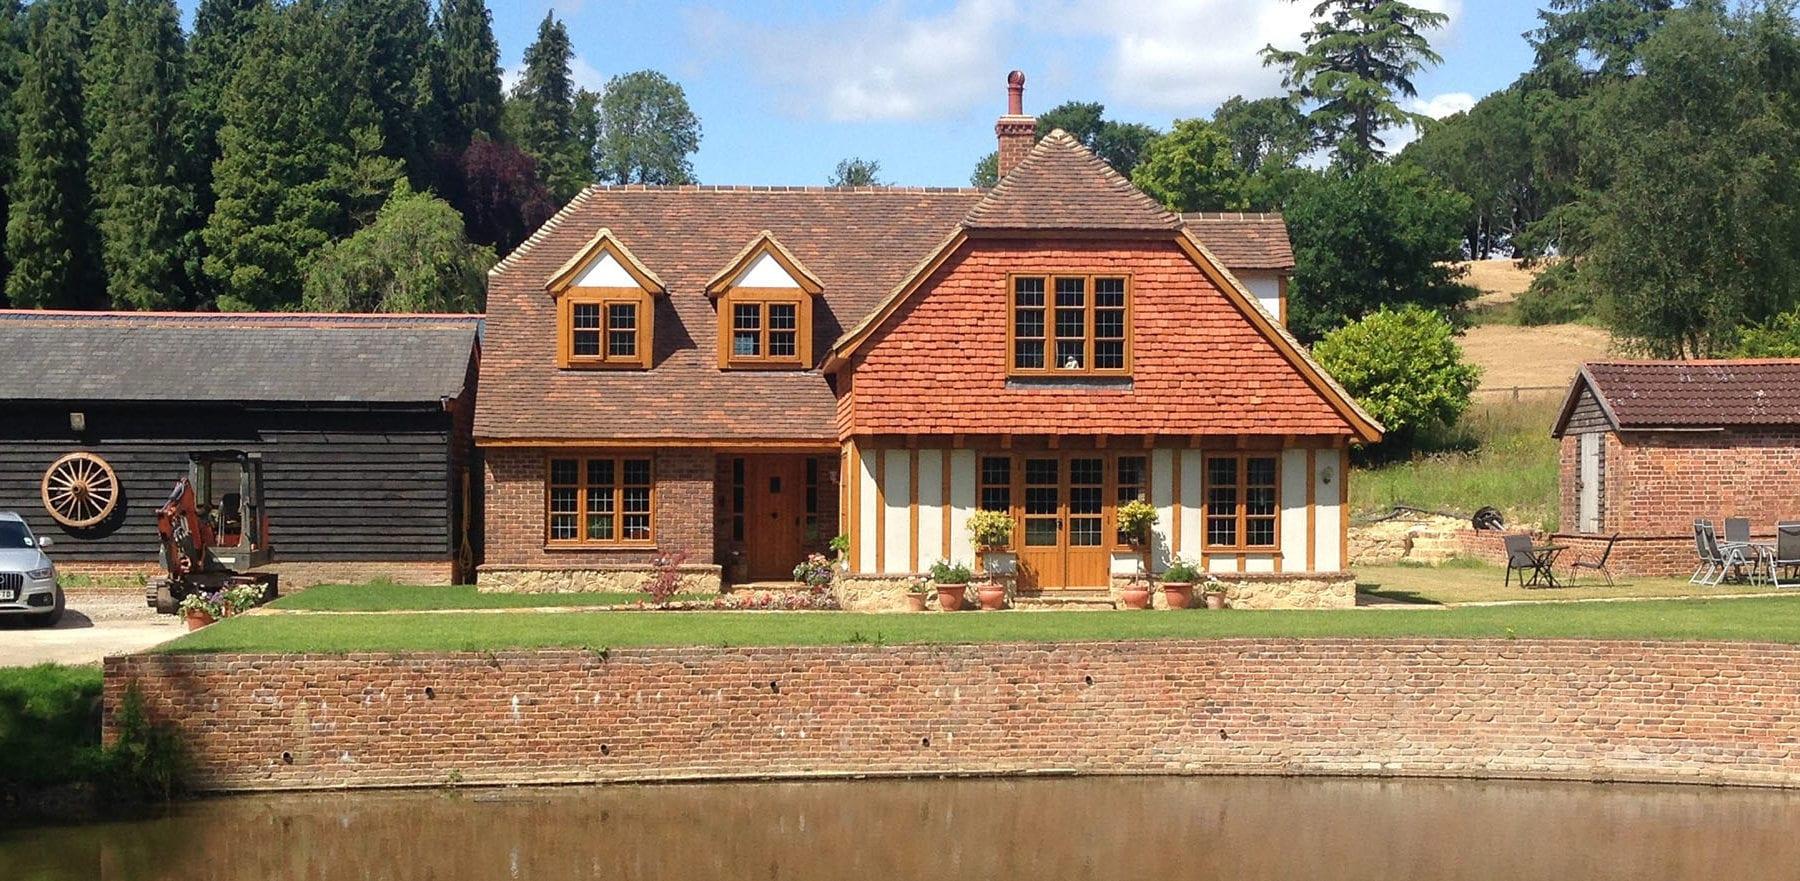 Lifestiles - Handmade Bespoke Clay Roof Tiles - Rotherfield, England 3